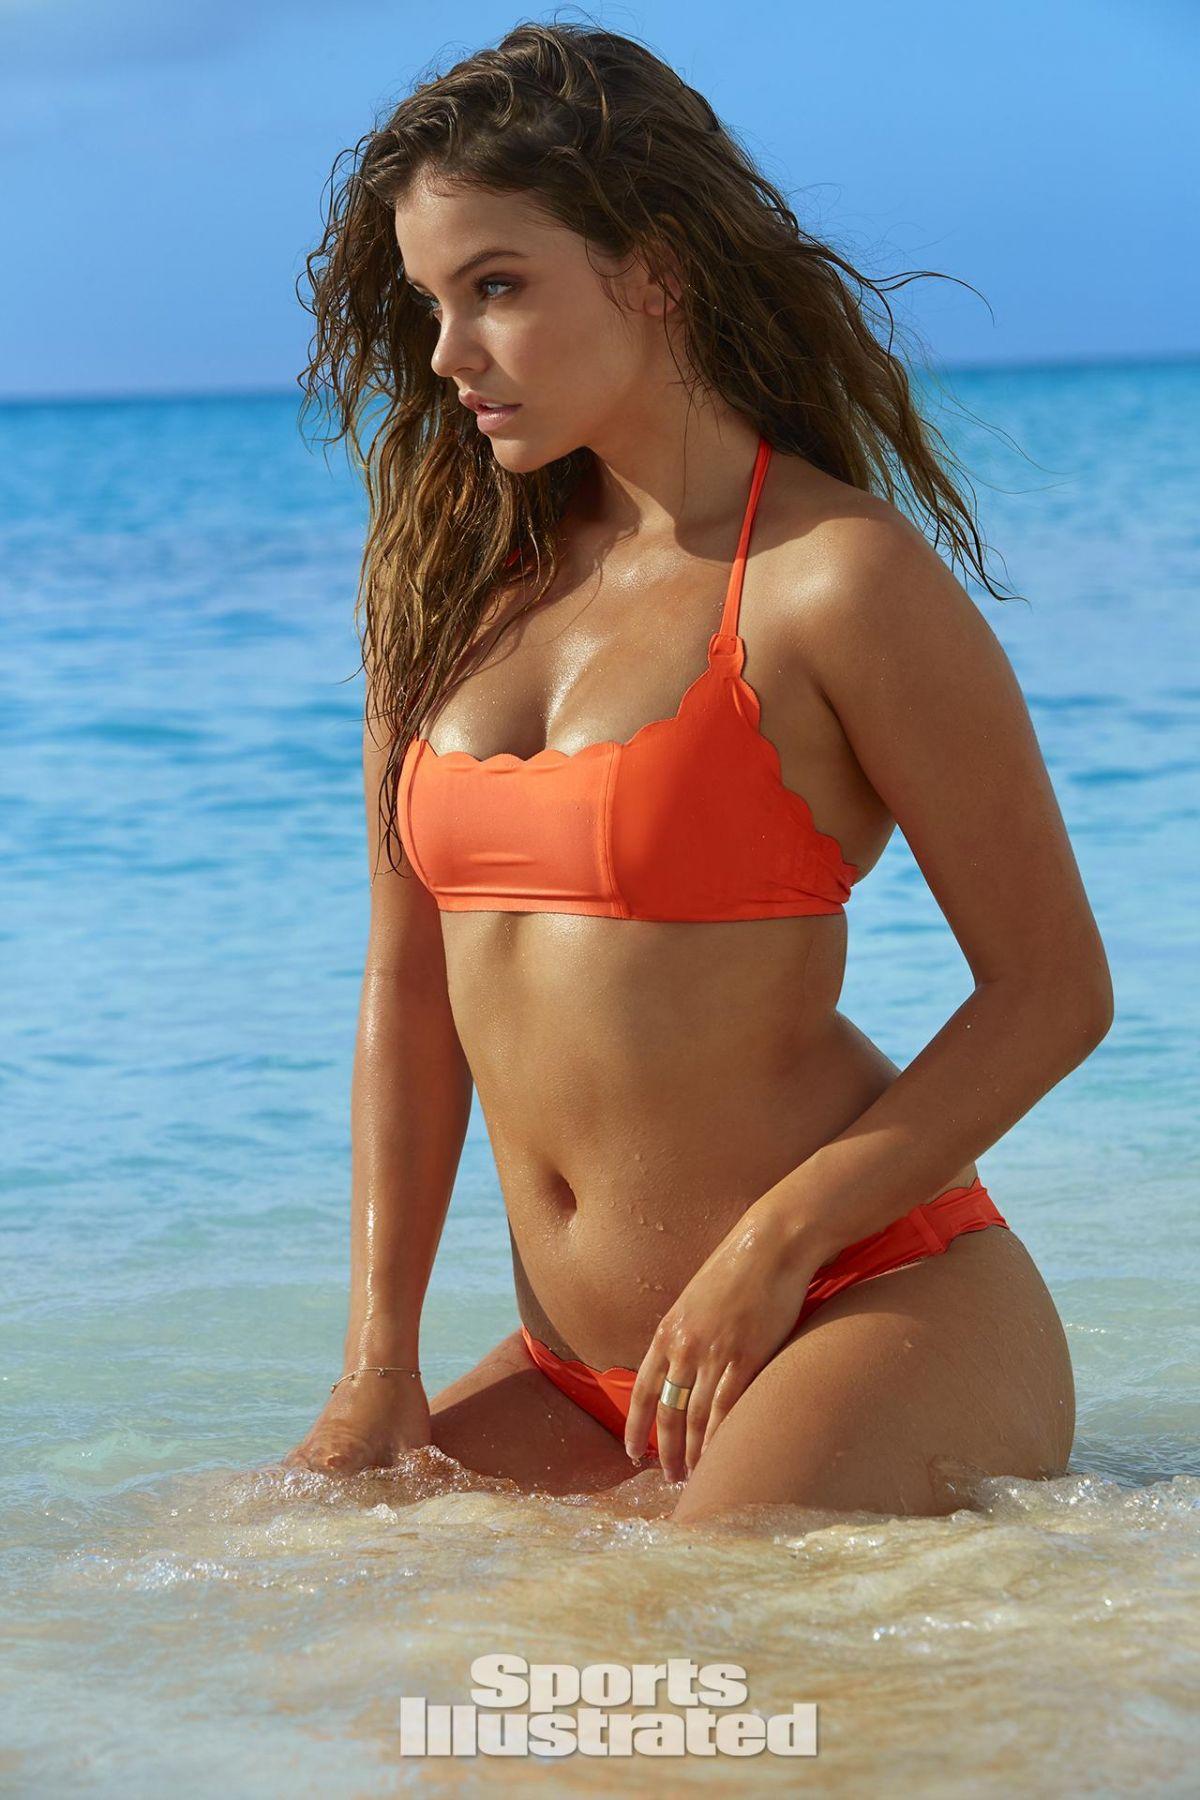 Bikini illustrated sports